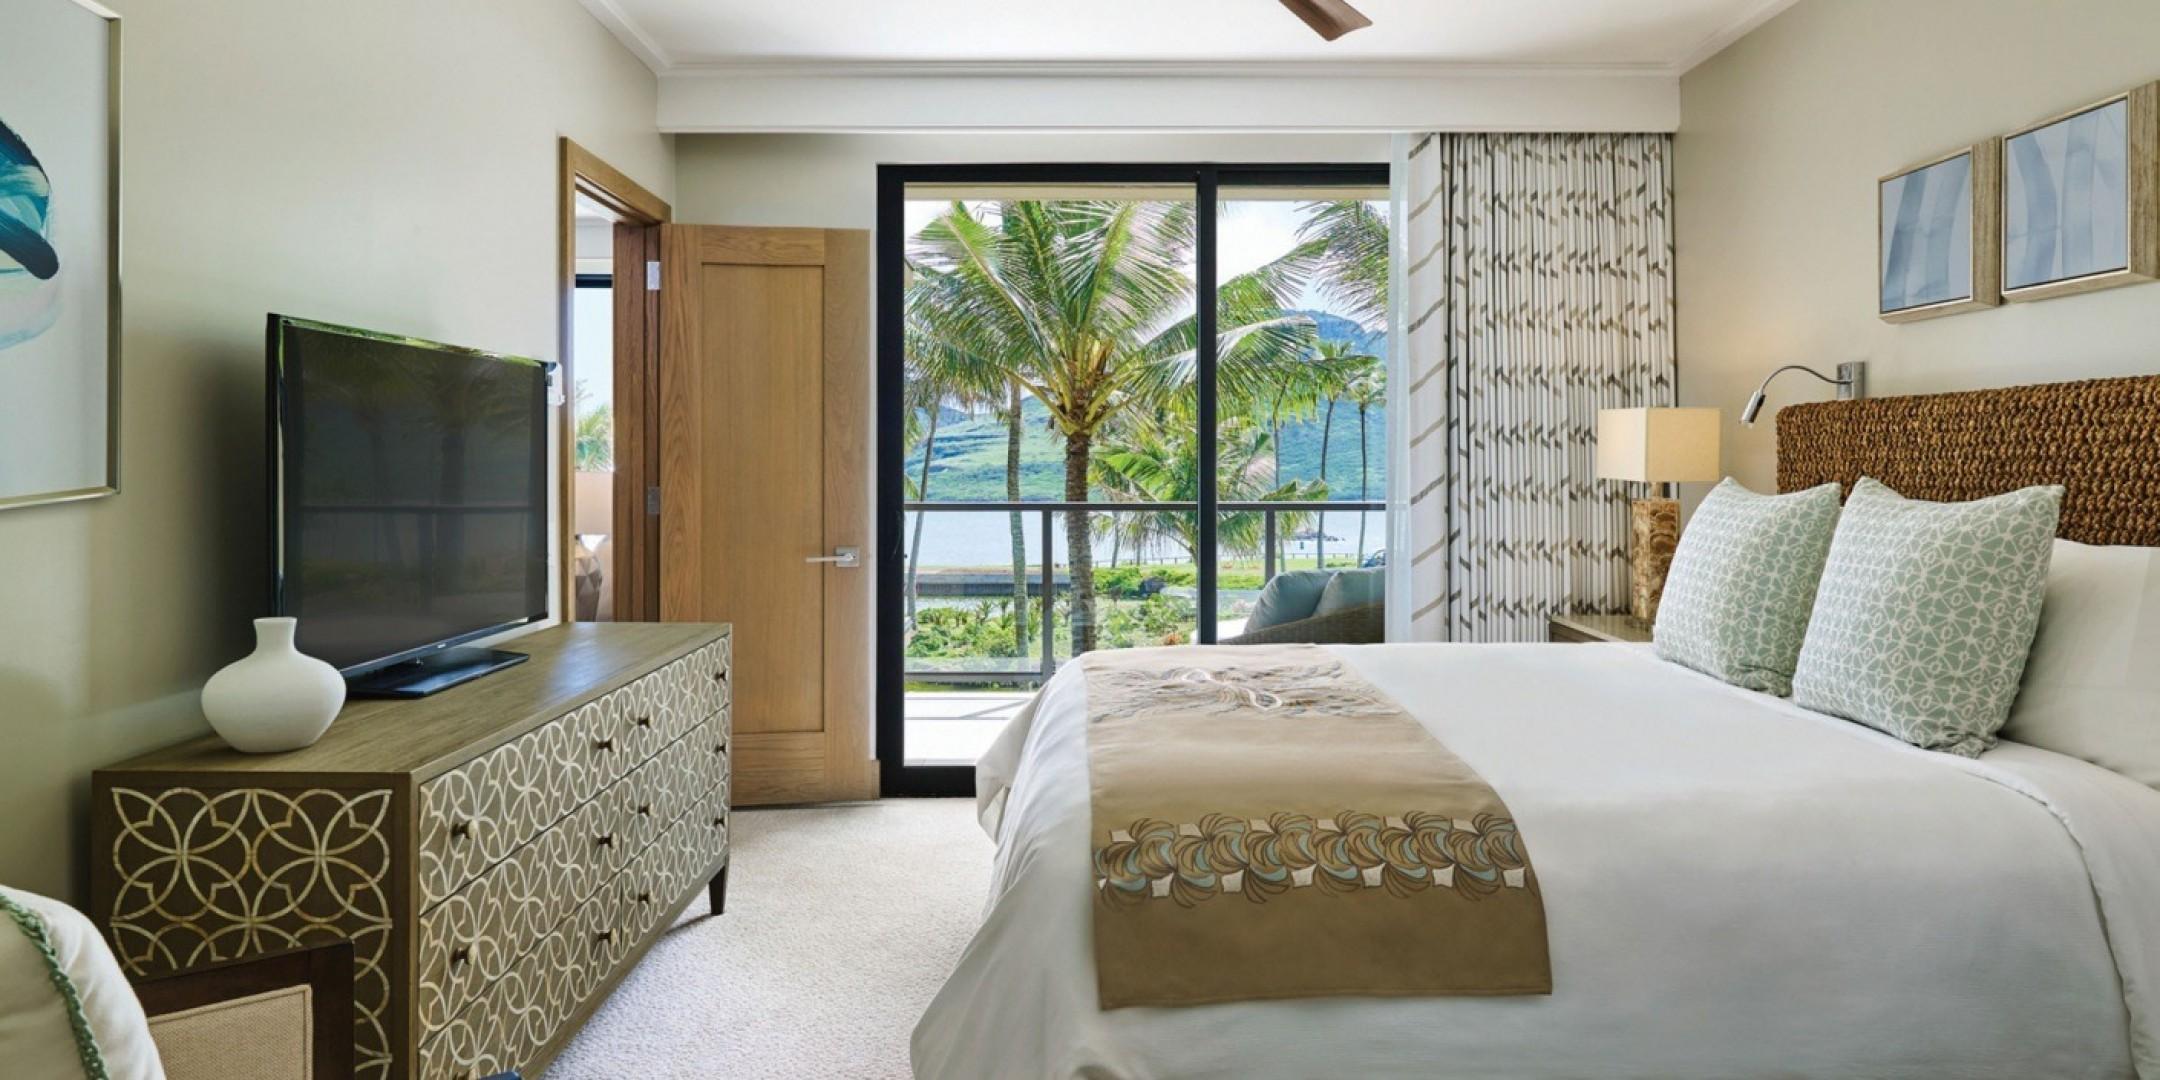 Spacious, luxurious bedrooms offer stunning ocean views.